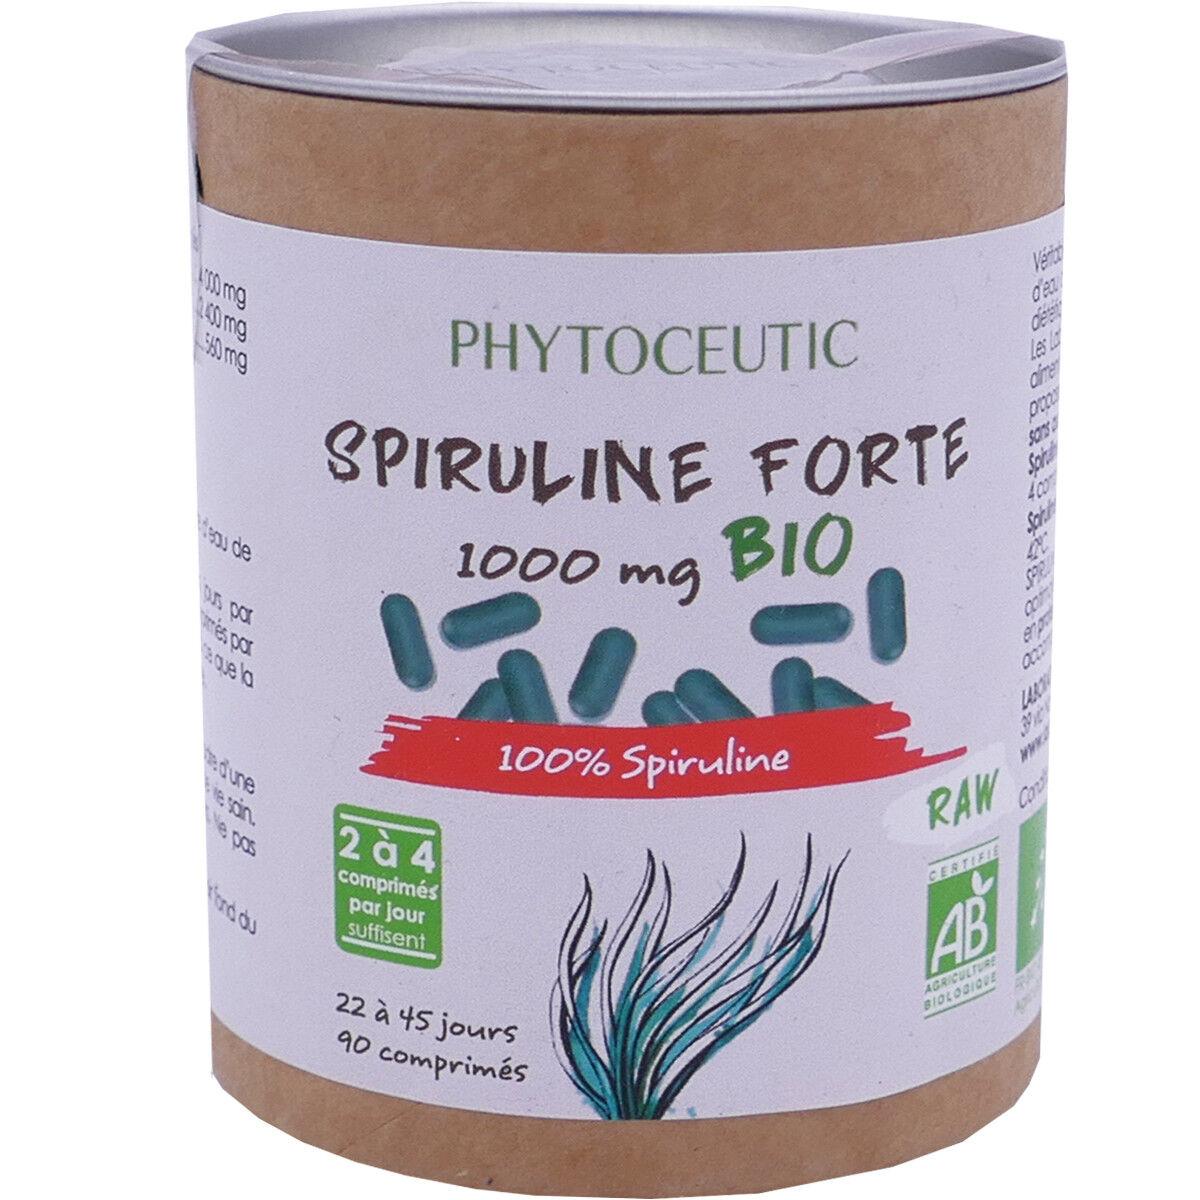 Phytoceutic spiruline forte 1000 mg bio 90 comprimes